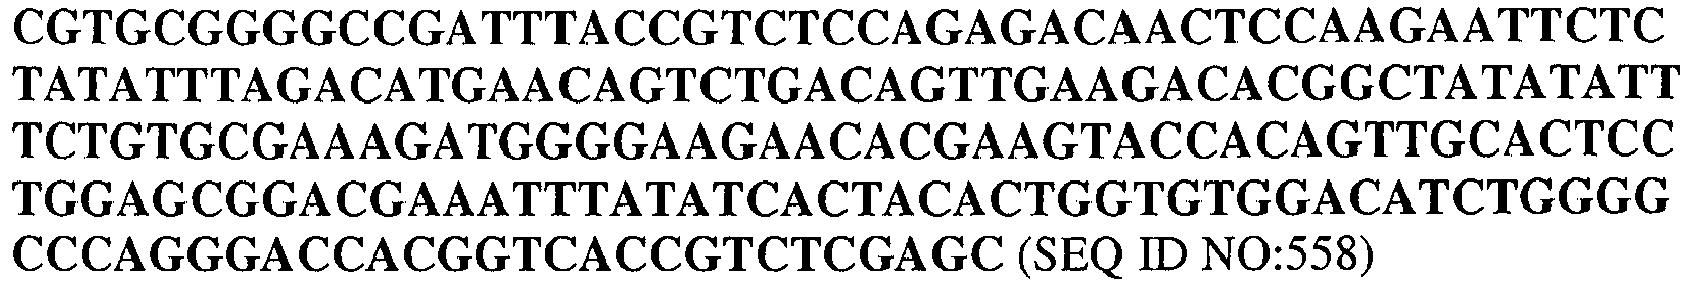 Figure imgb0410